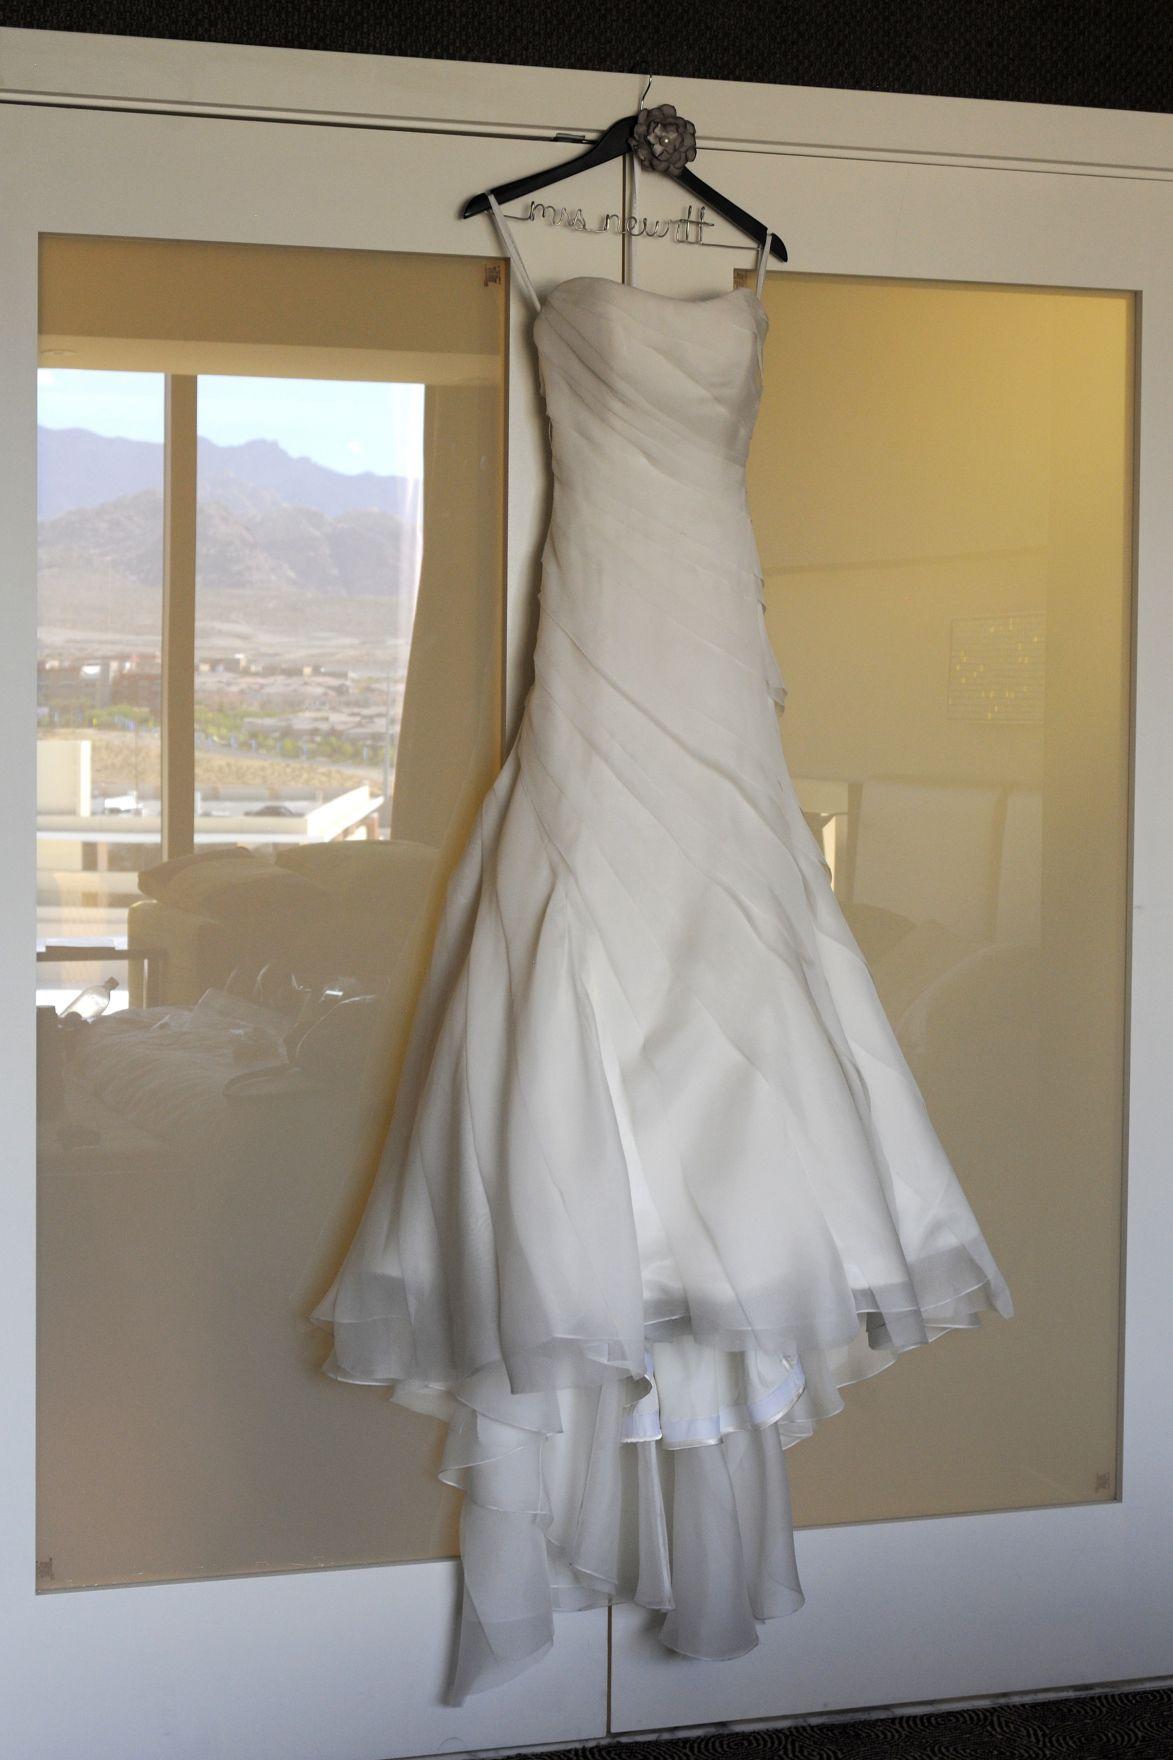 100+ Decorative Hangers for Wedding Dresses - Wedding Dresses for ...